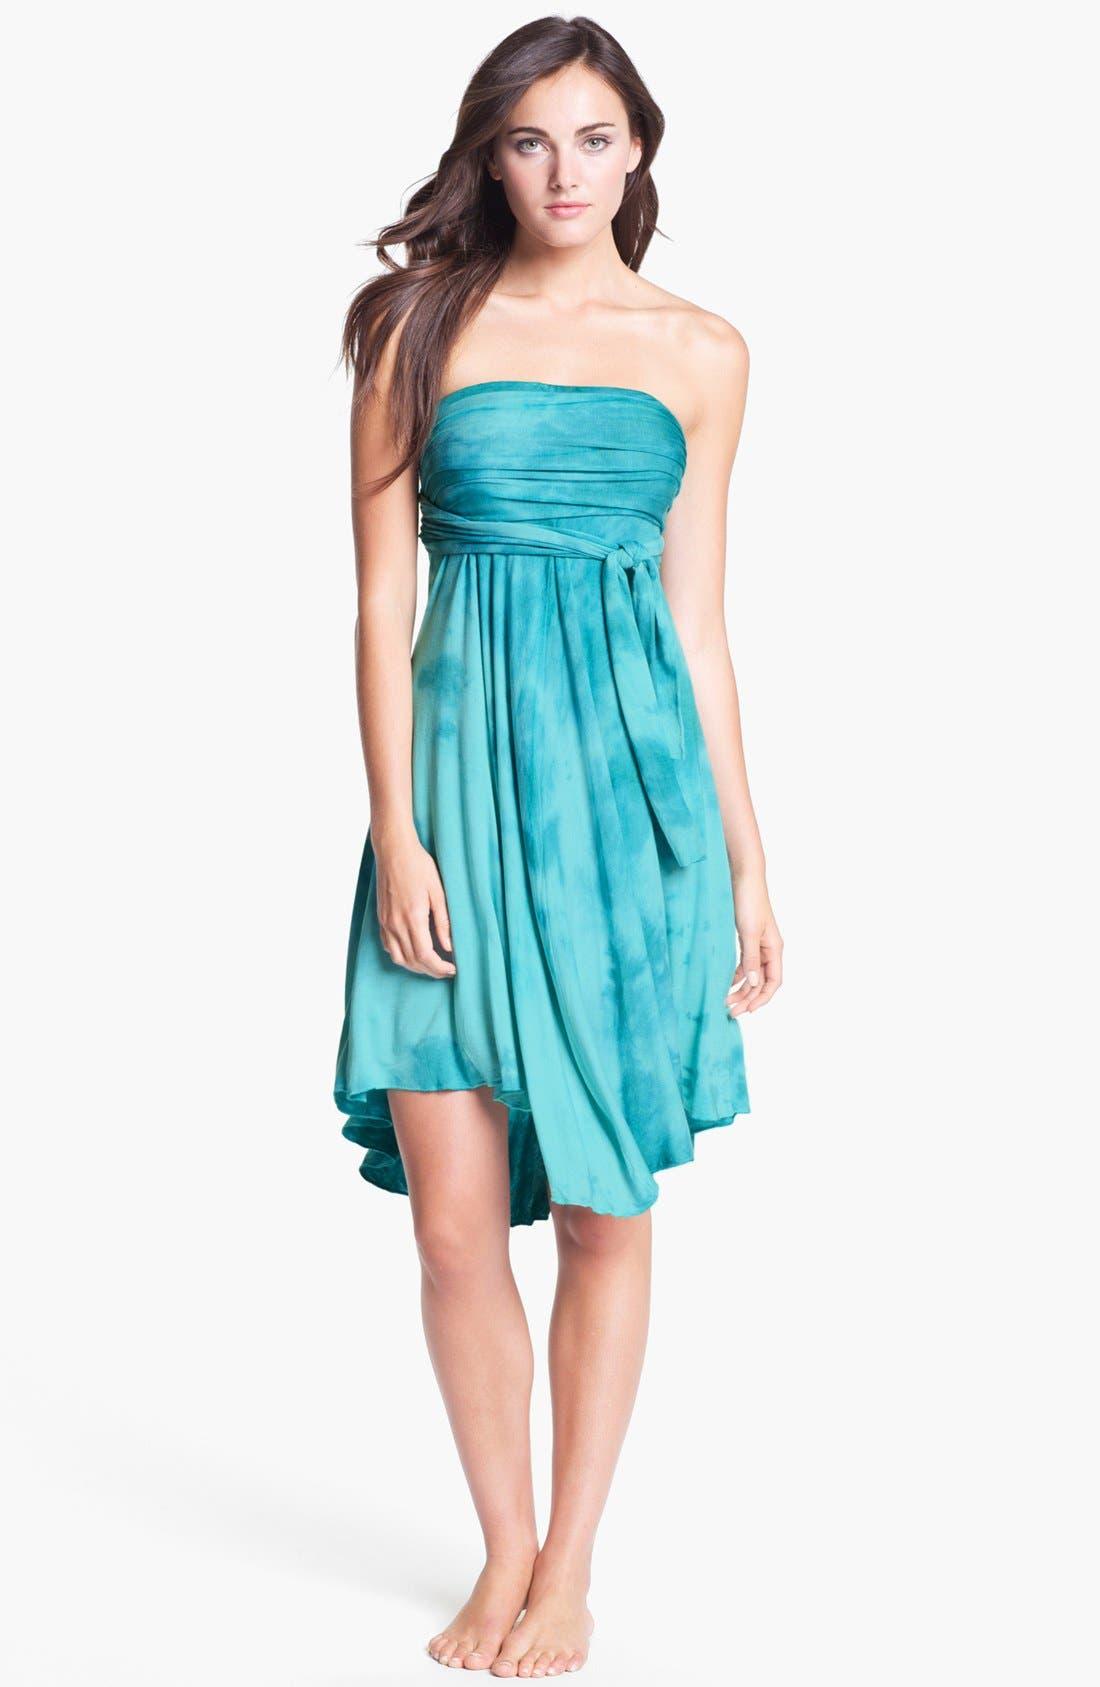 Main Image - Elan Tie Dye Convertible Cover-Up Dress